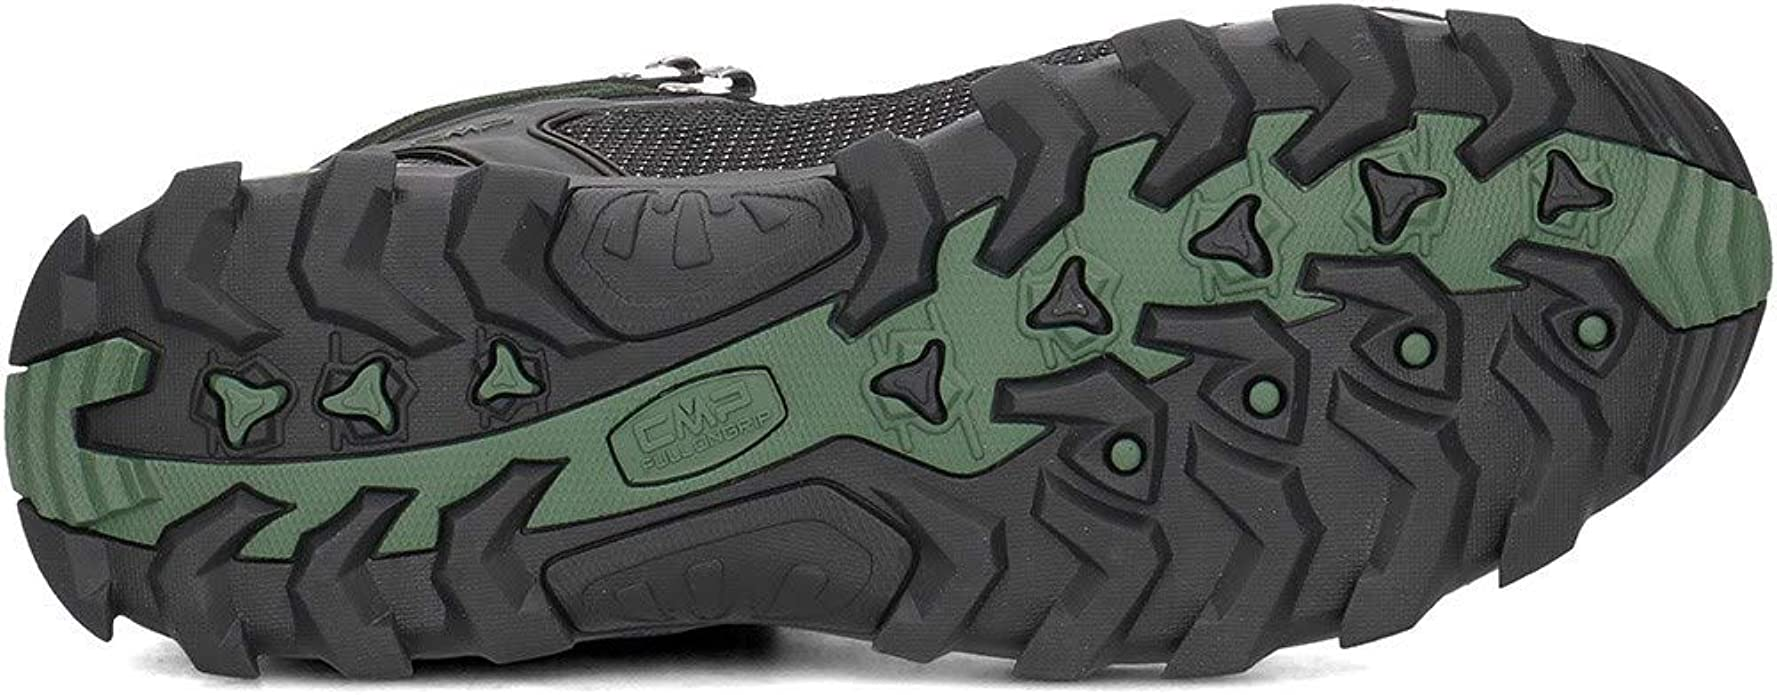 CMP Rigel Mid Zapatos de High Rise Senderismo para Hombre